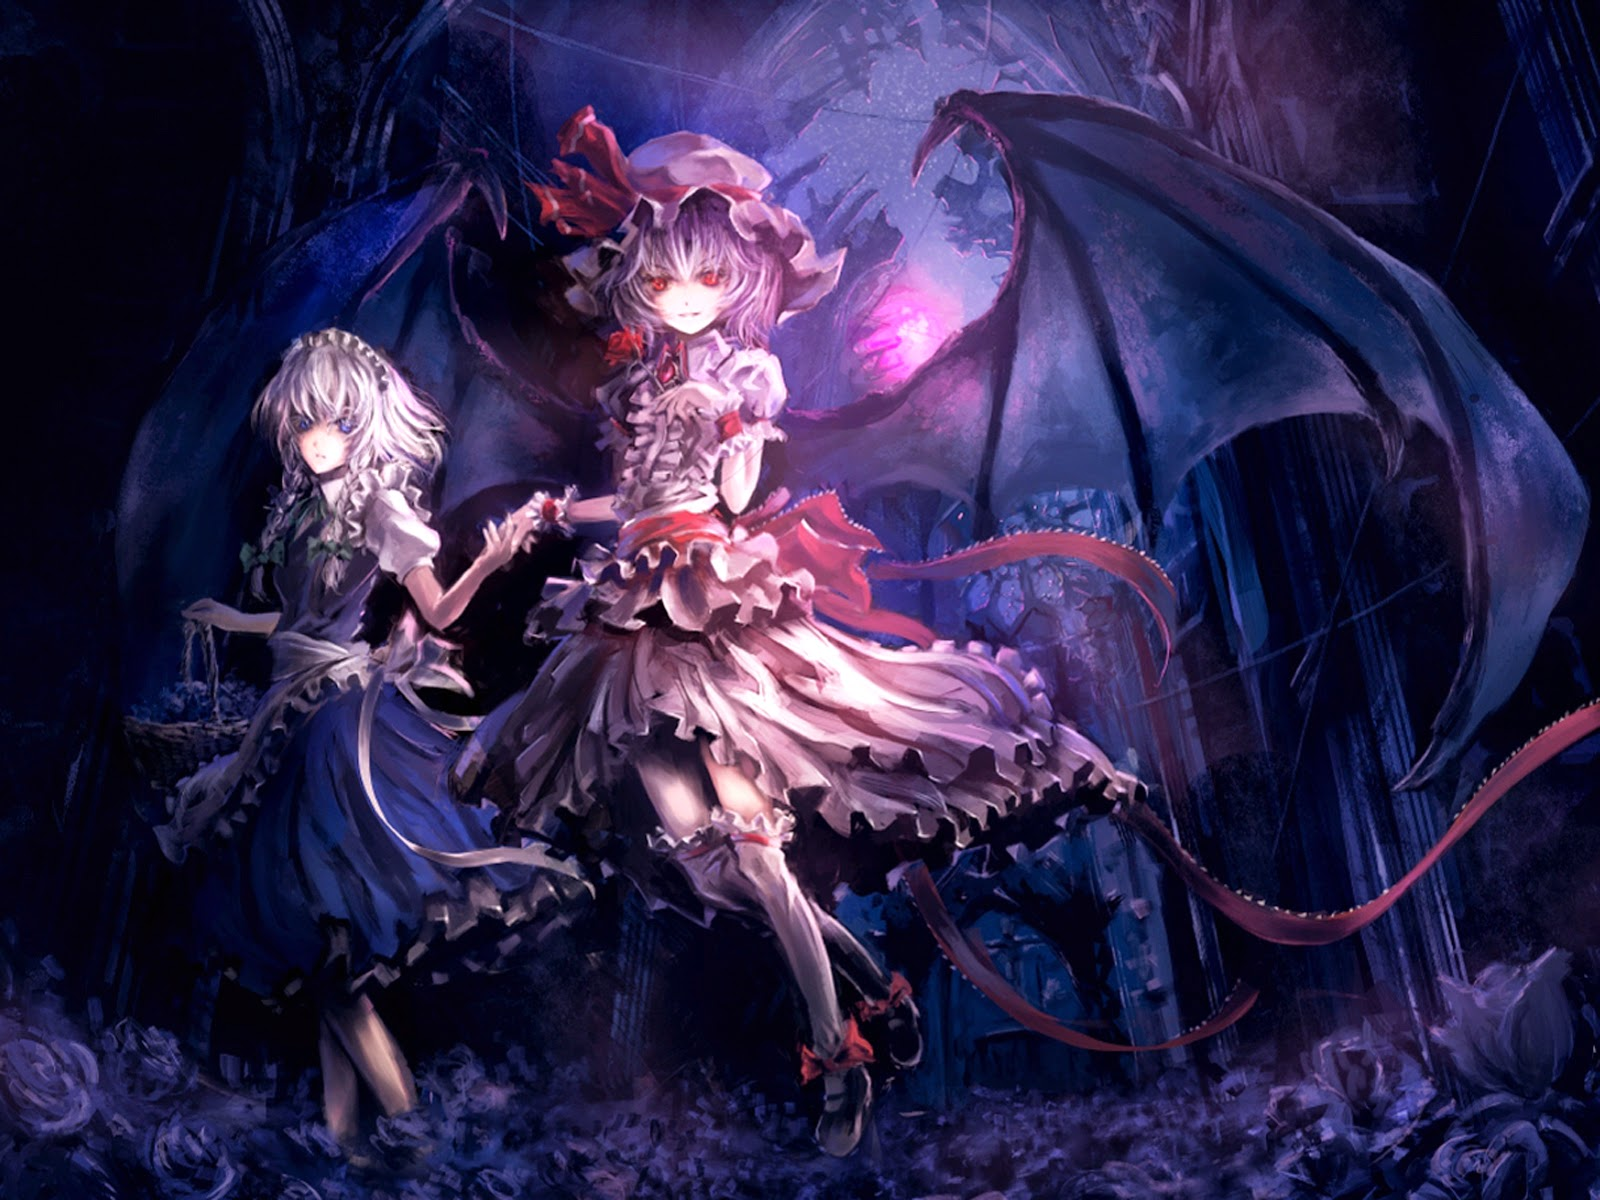 Attack of the unicorn dress black - Jigoku Shoujo Lust Devil Bears Devil Girl Devilbear Daiva Wallpaper